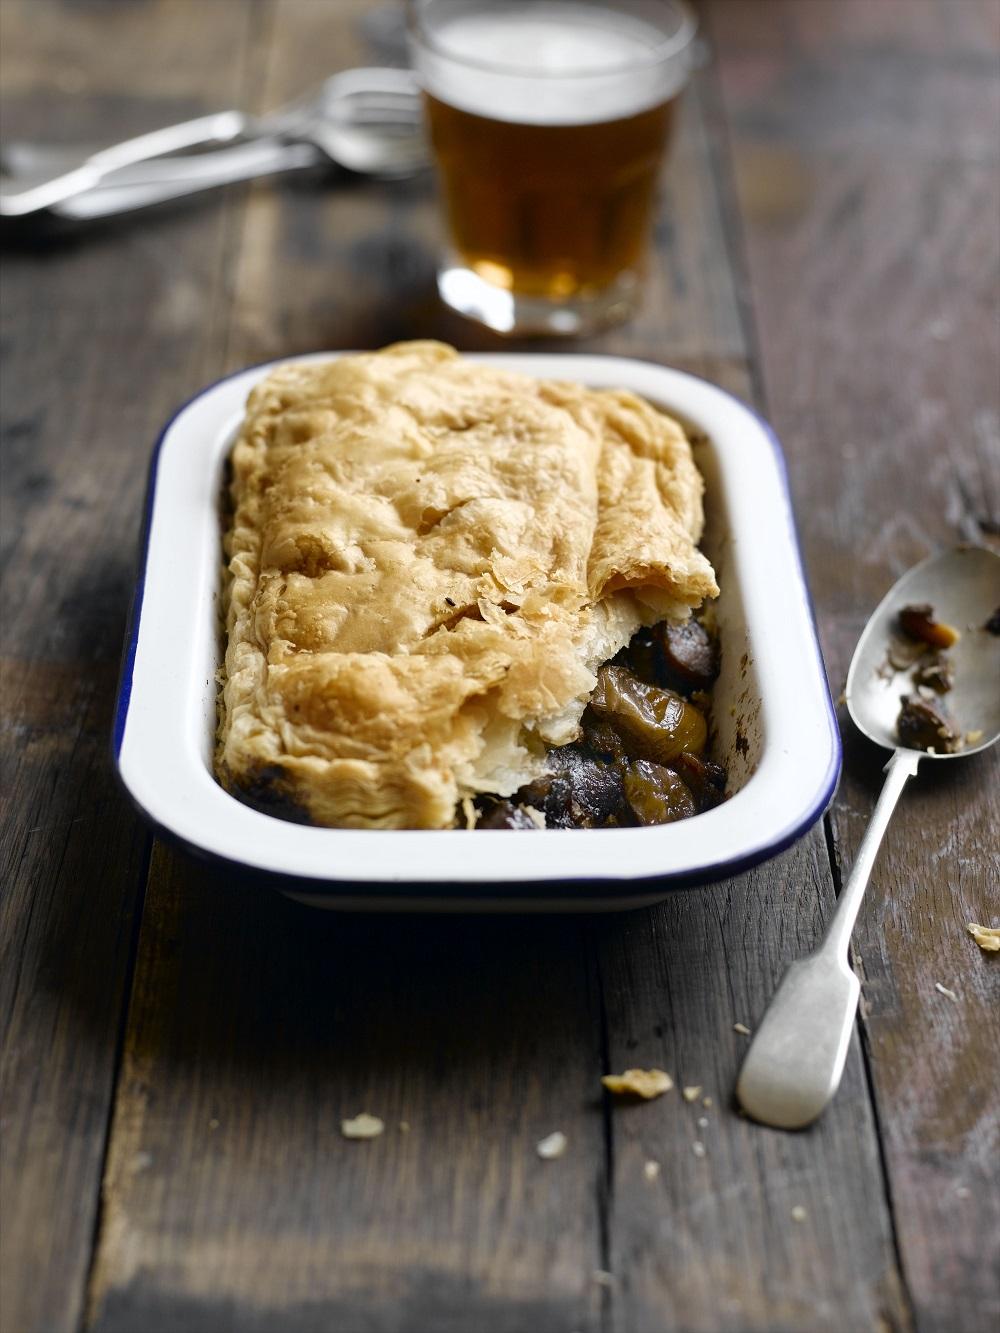 How To Make A Chestnut, Mushroom And Shallot Pie